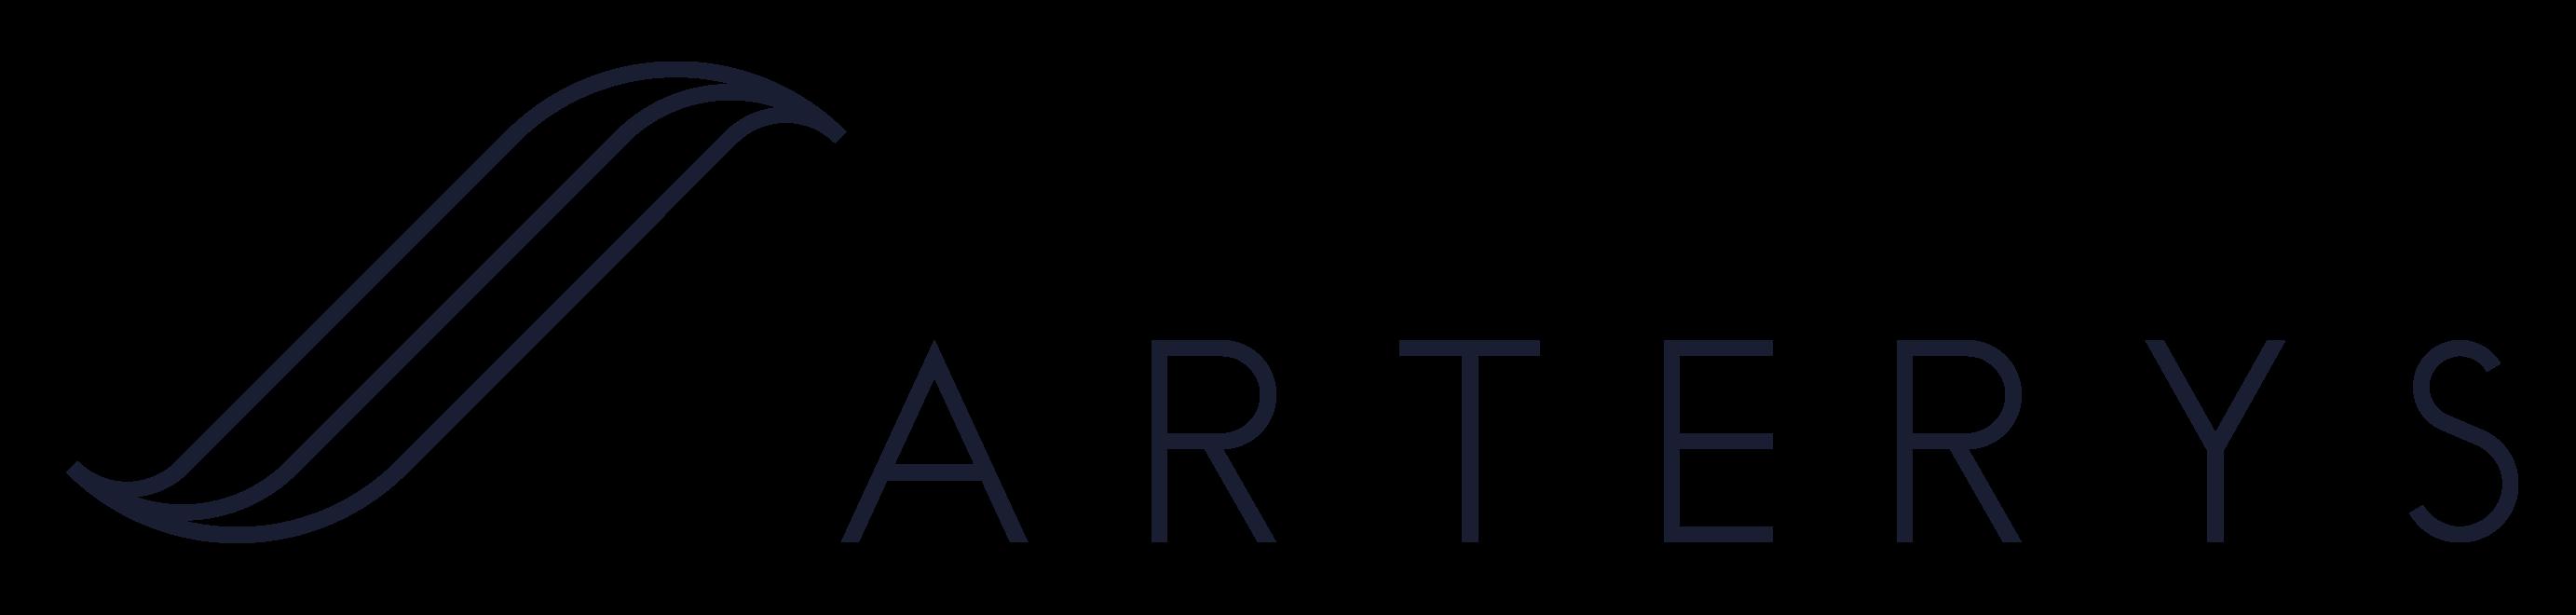 arterys-logo-trans-1